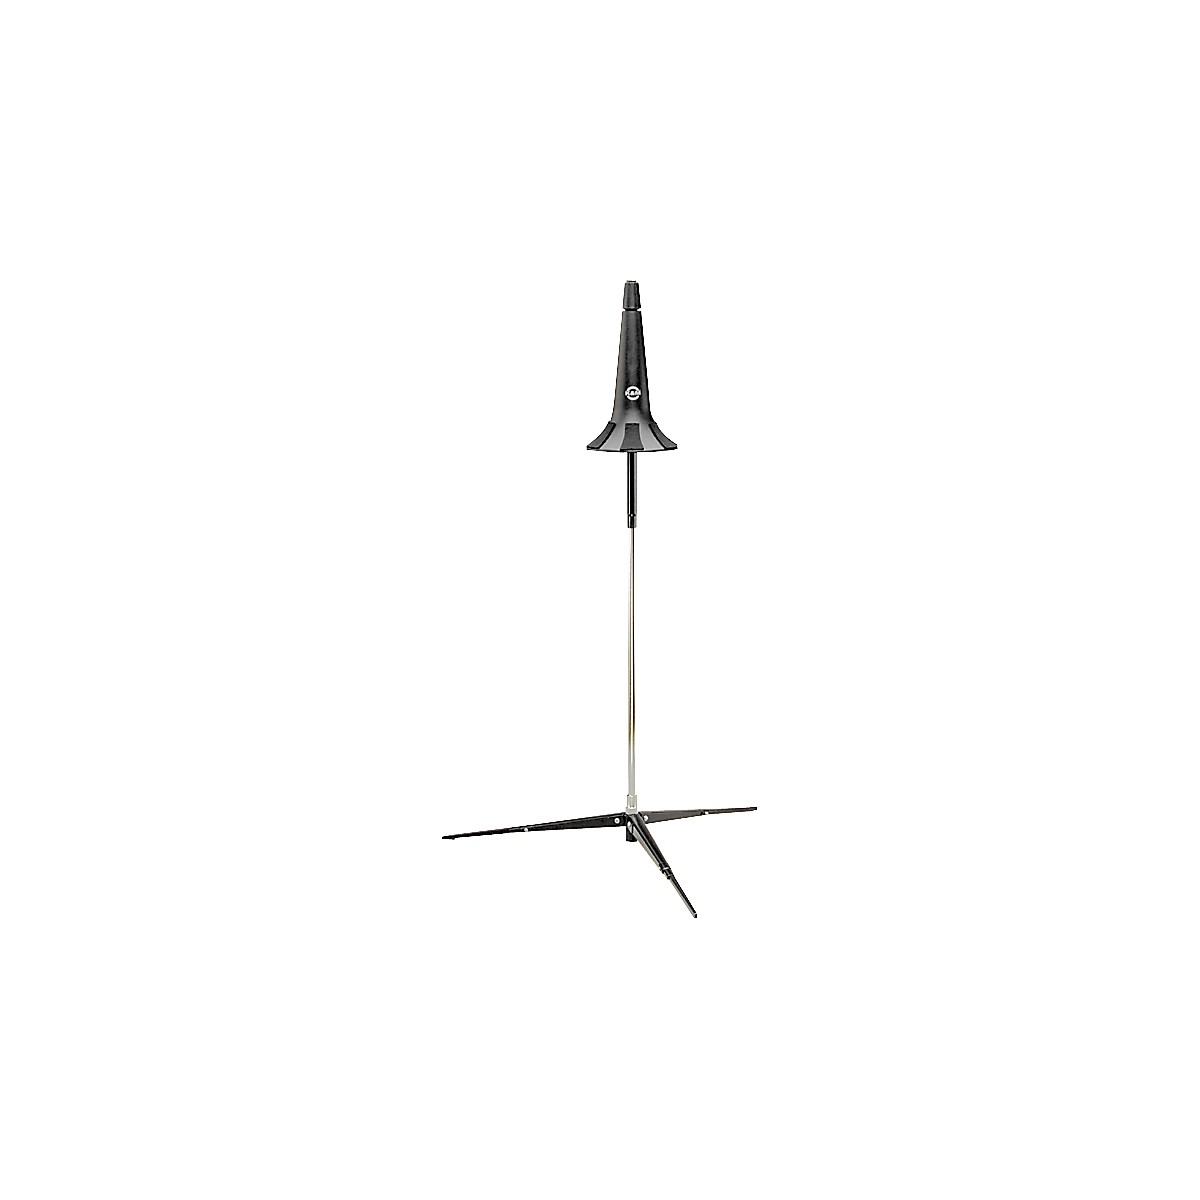 K&M 15270 In-Bell Trombone Stand